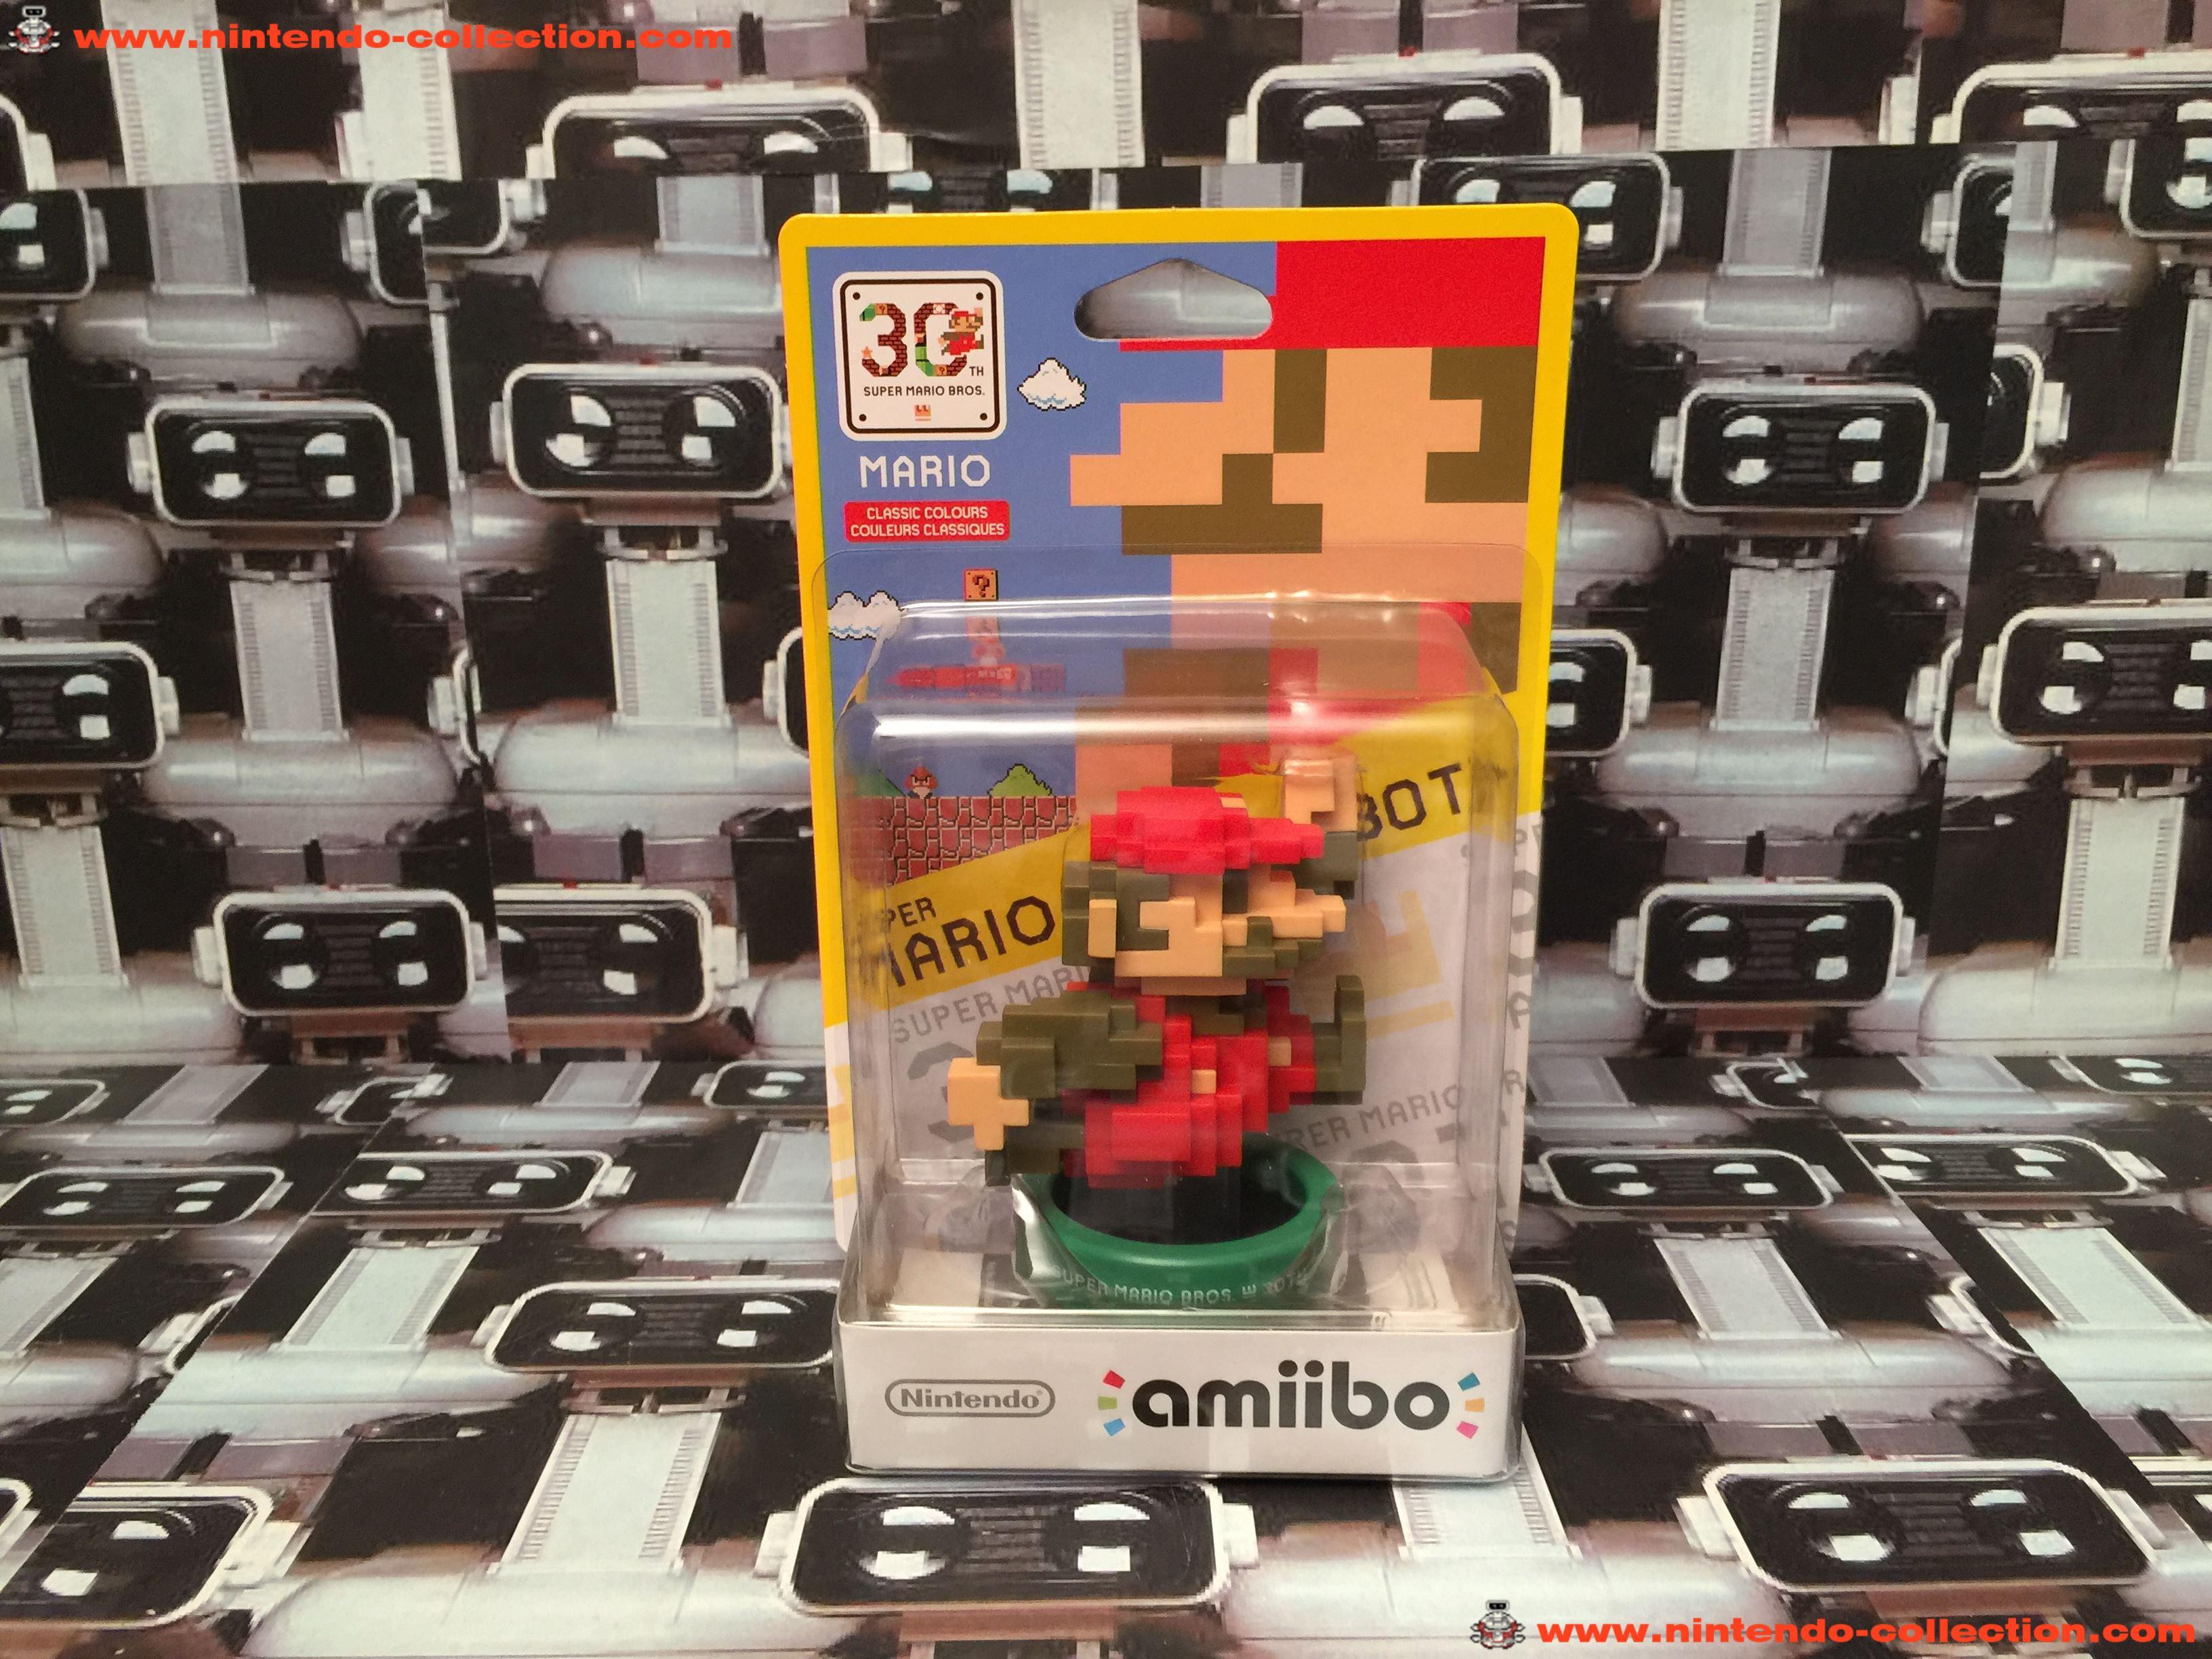 www.nintendo-collection.com - Amiibo Mario 30th Classic Colors - 0